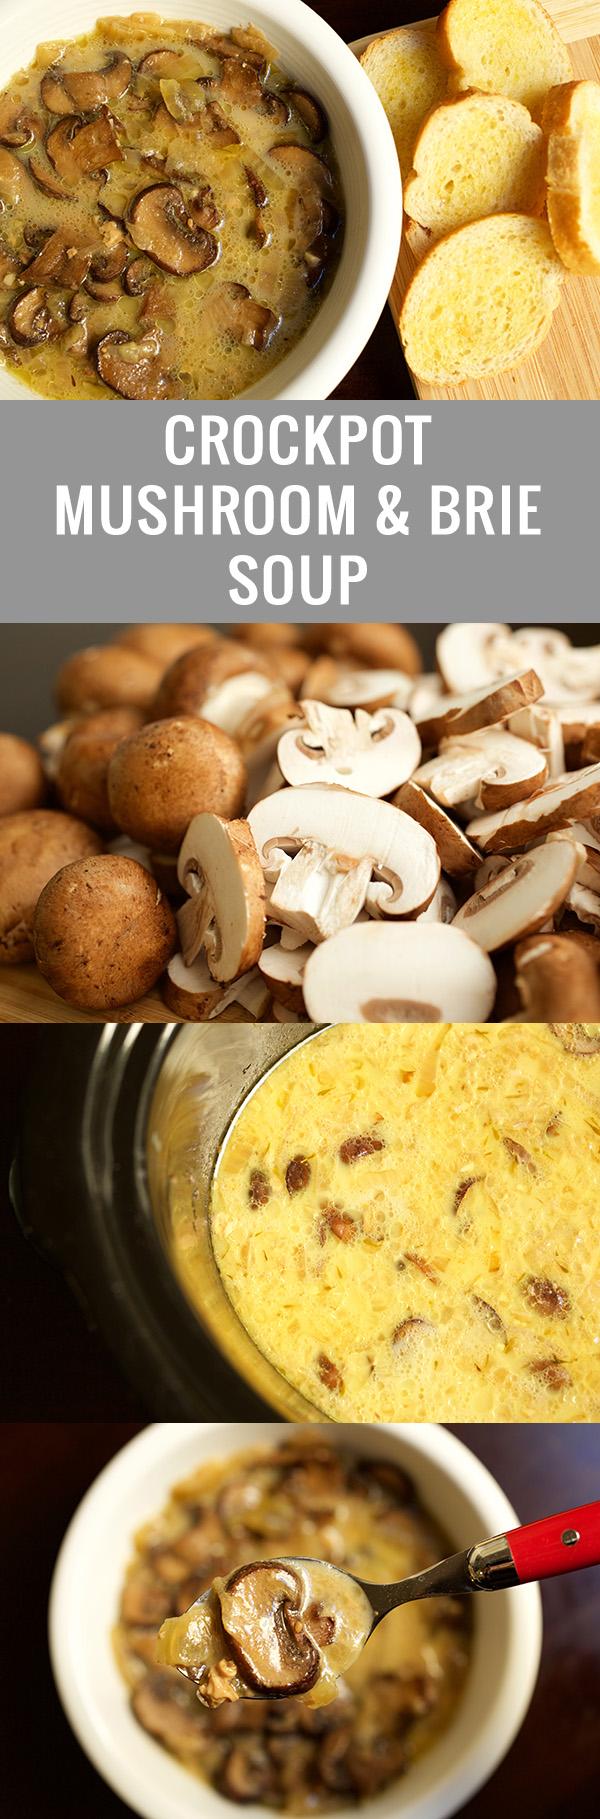 Crock Pot Mushroom & Brie Soup